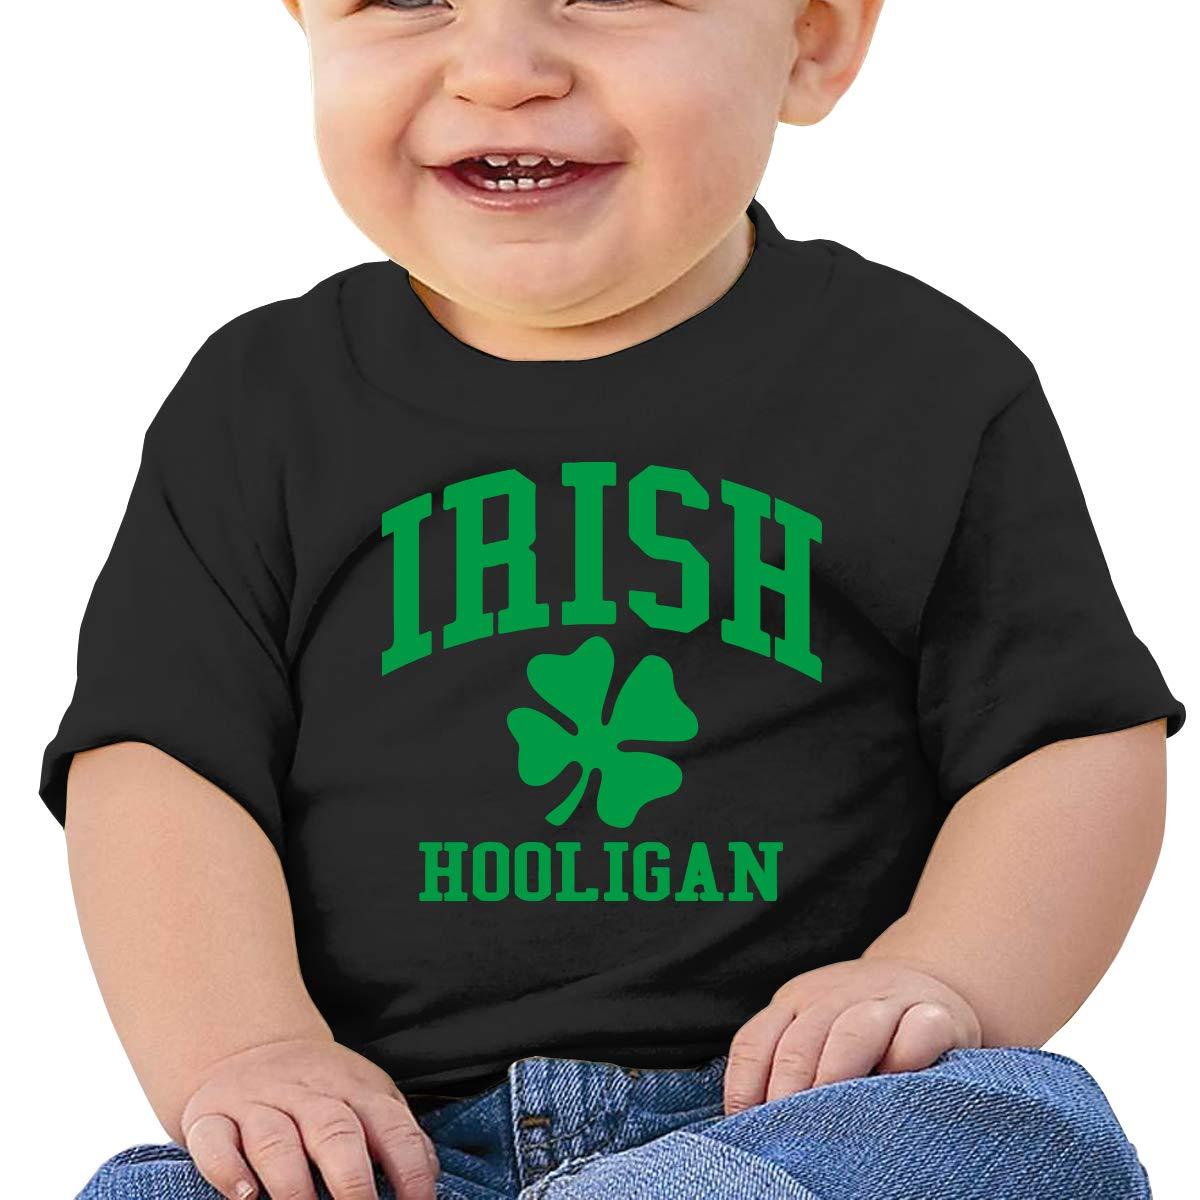 Irish Hooligan Baby Boys Girls Short Sleeve Crewneck T Shirts 6-18 Month Tops